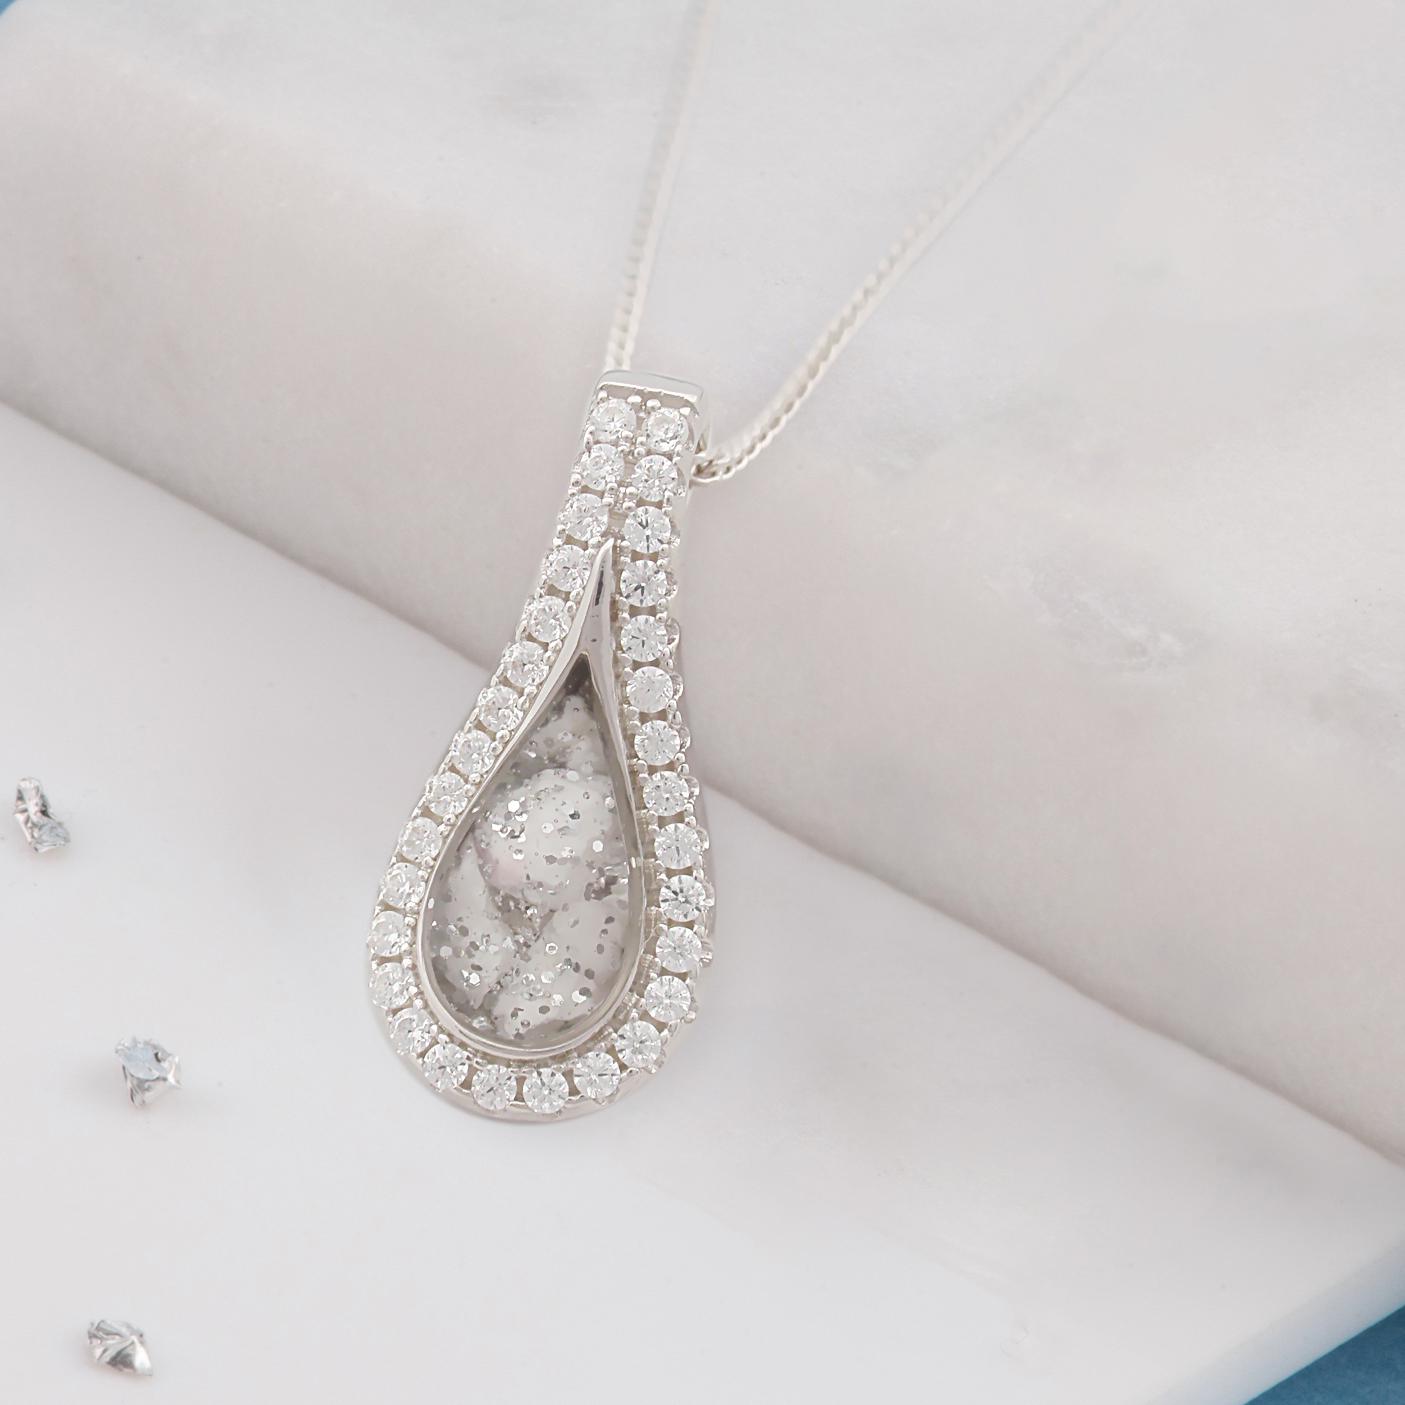 Organic medium teardrop ashes or hair crystal pendant